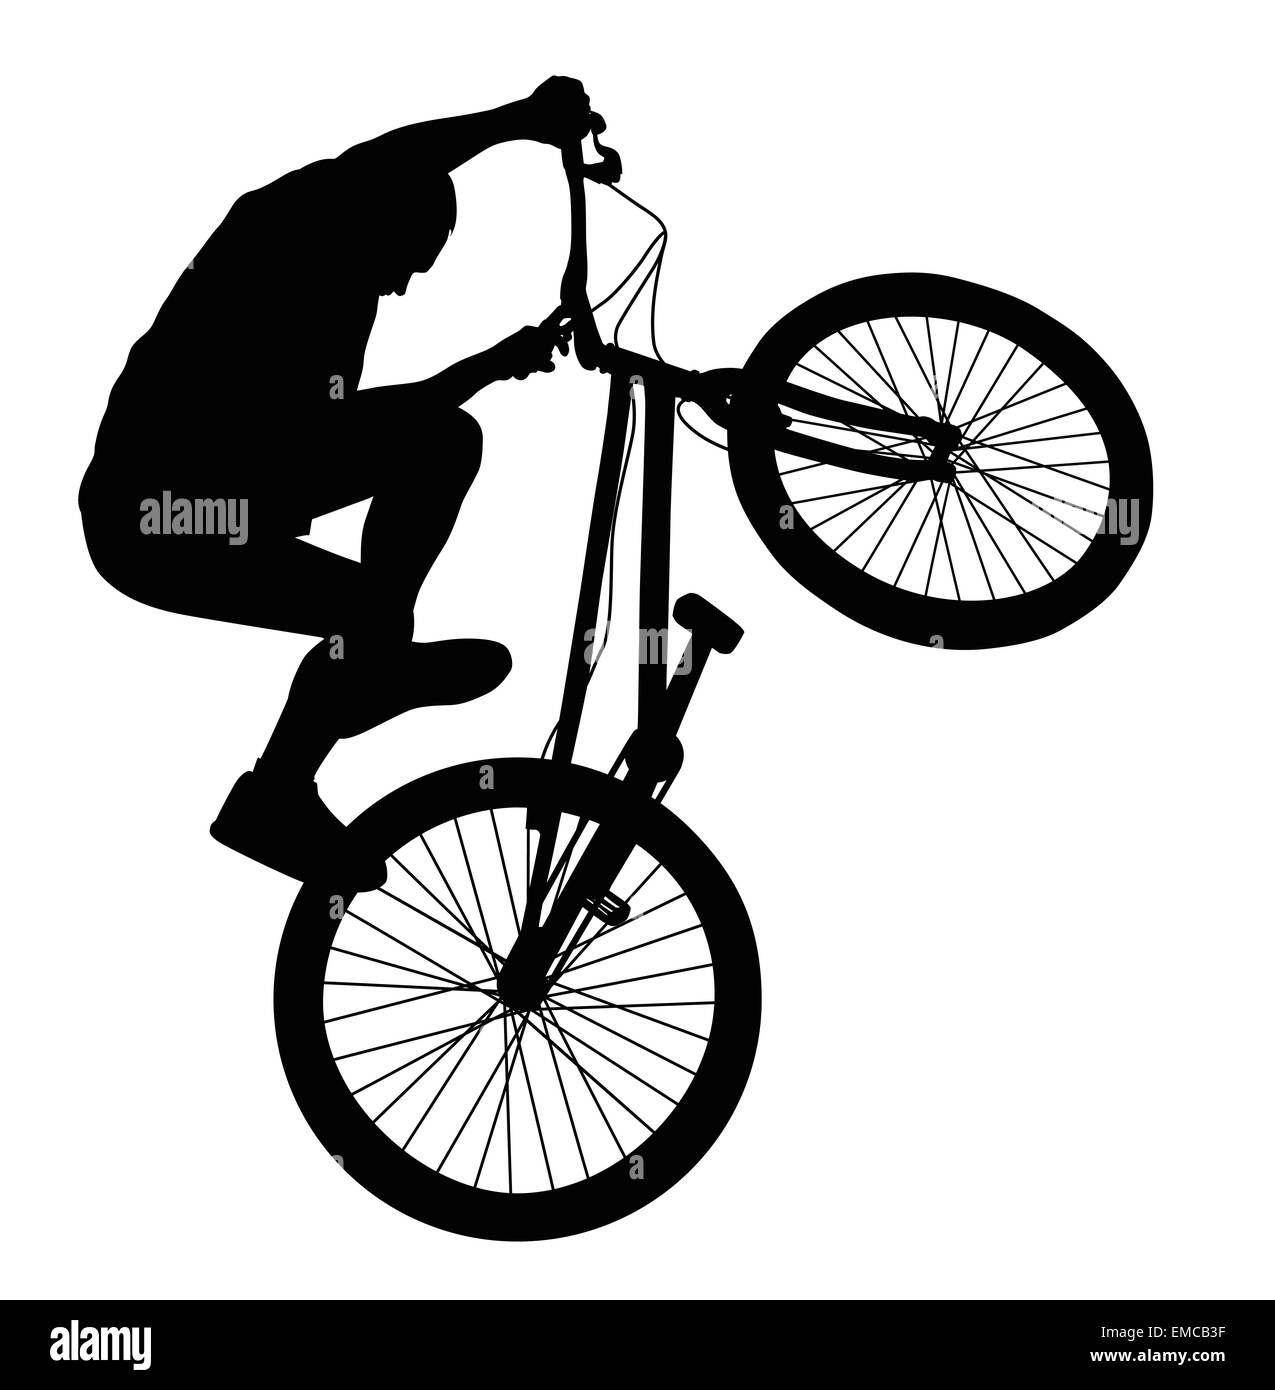 Biker vector silhouette - Stock Image